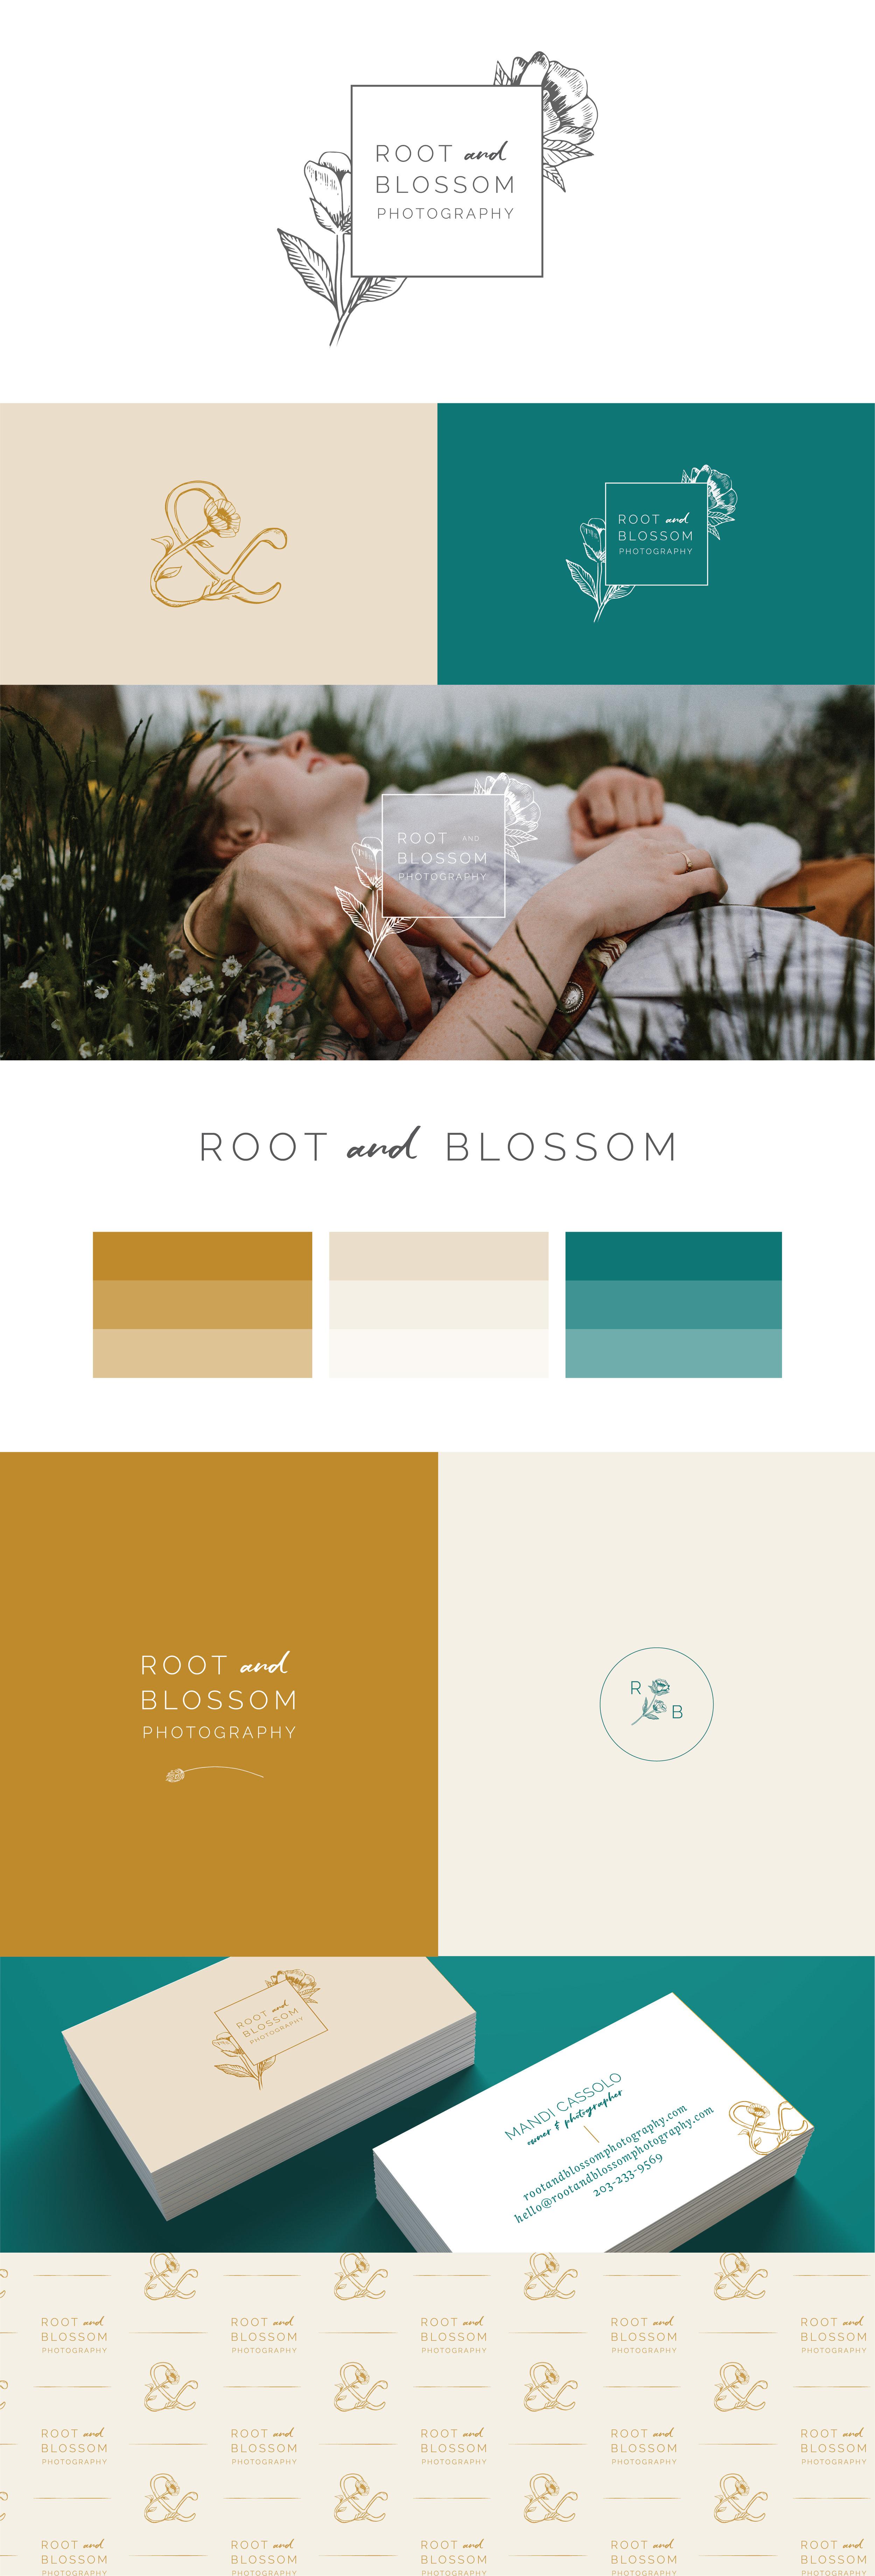 Root&Blossom_GoodDayDesignCo_Branding.jpg